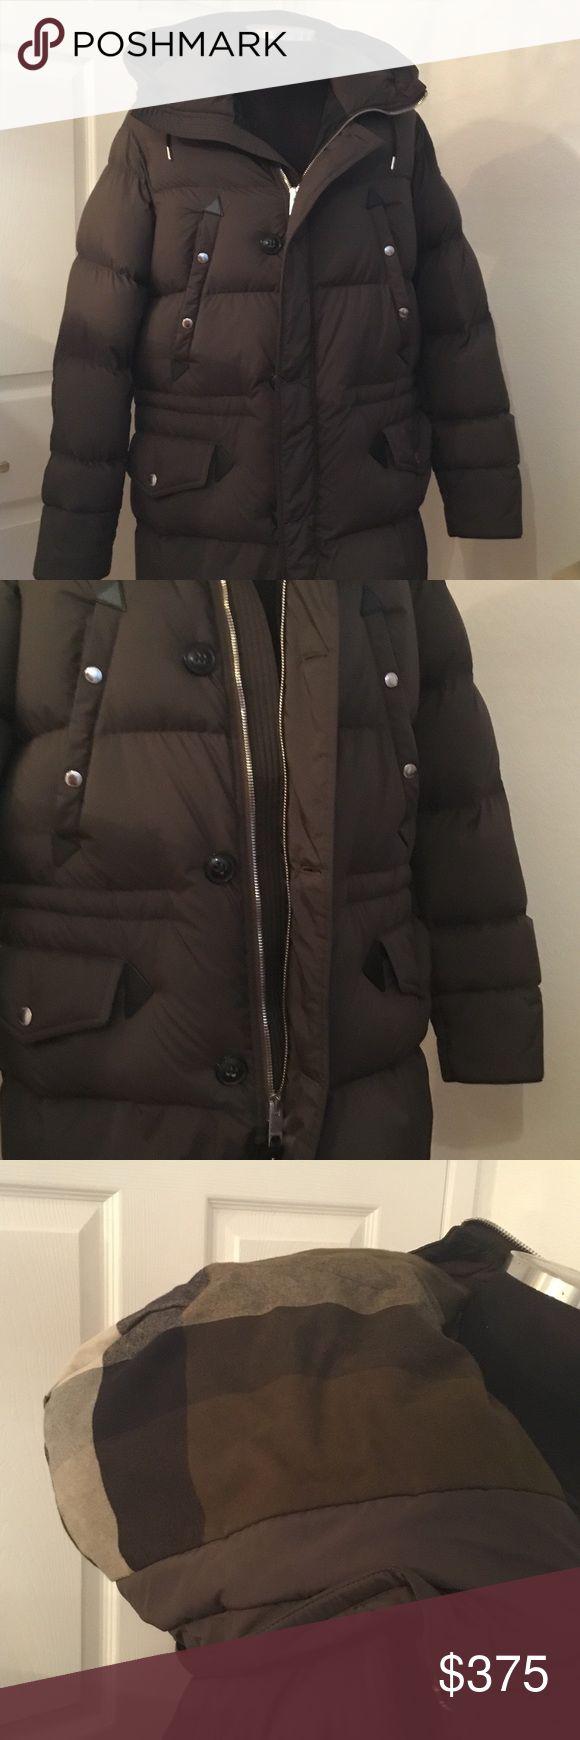 Mens jacket hs code - Burberry Men S Jacket Nwt